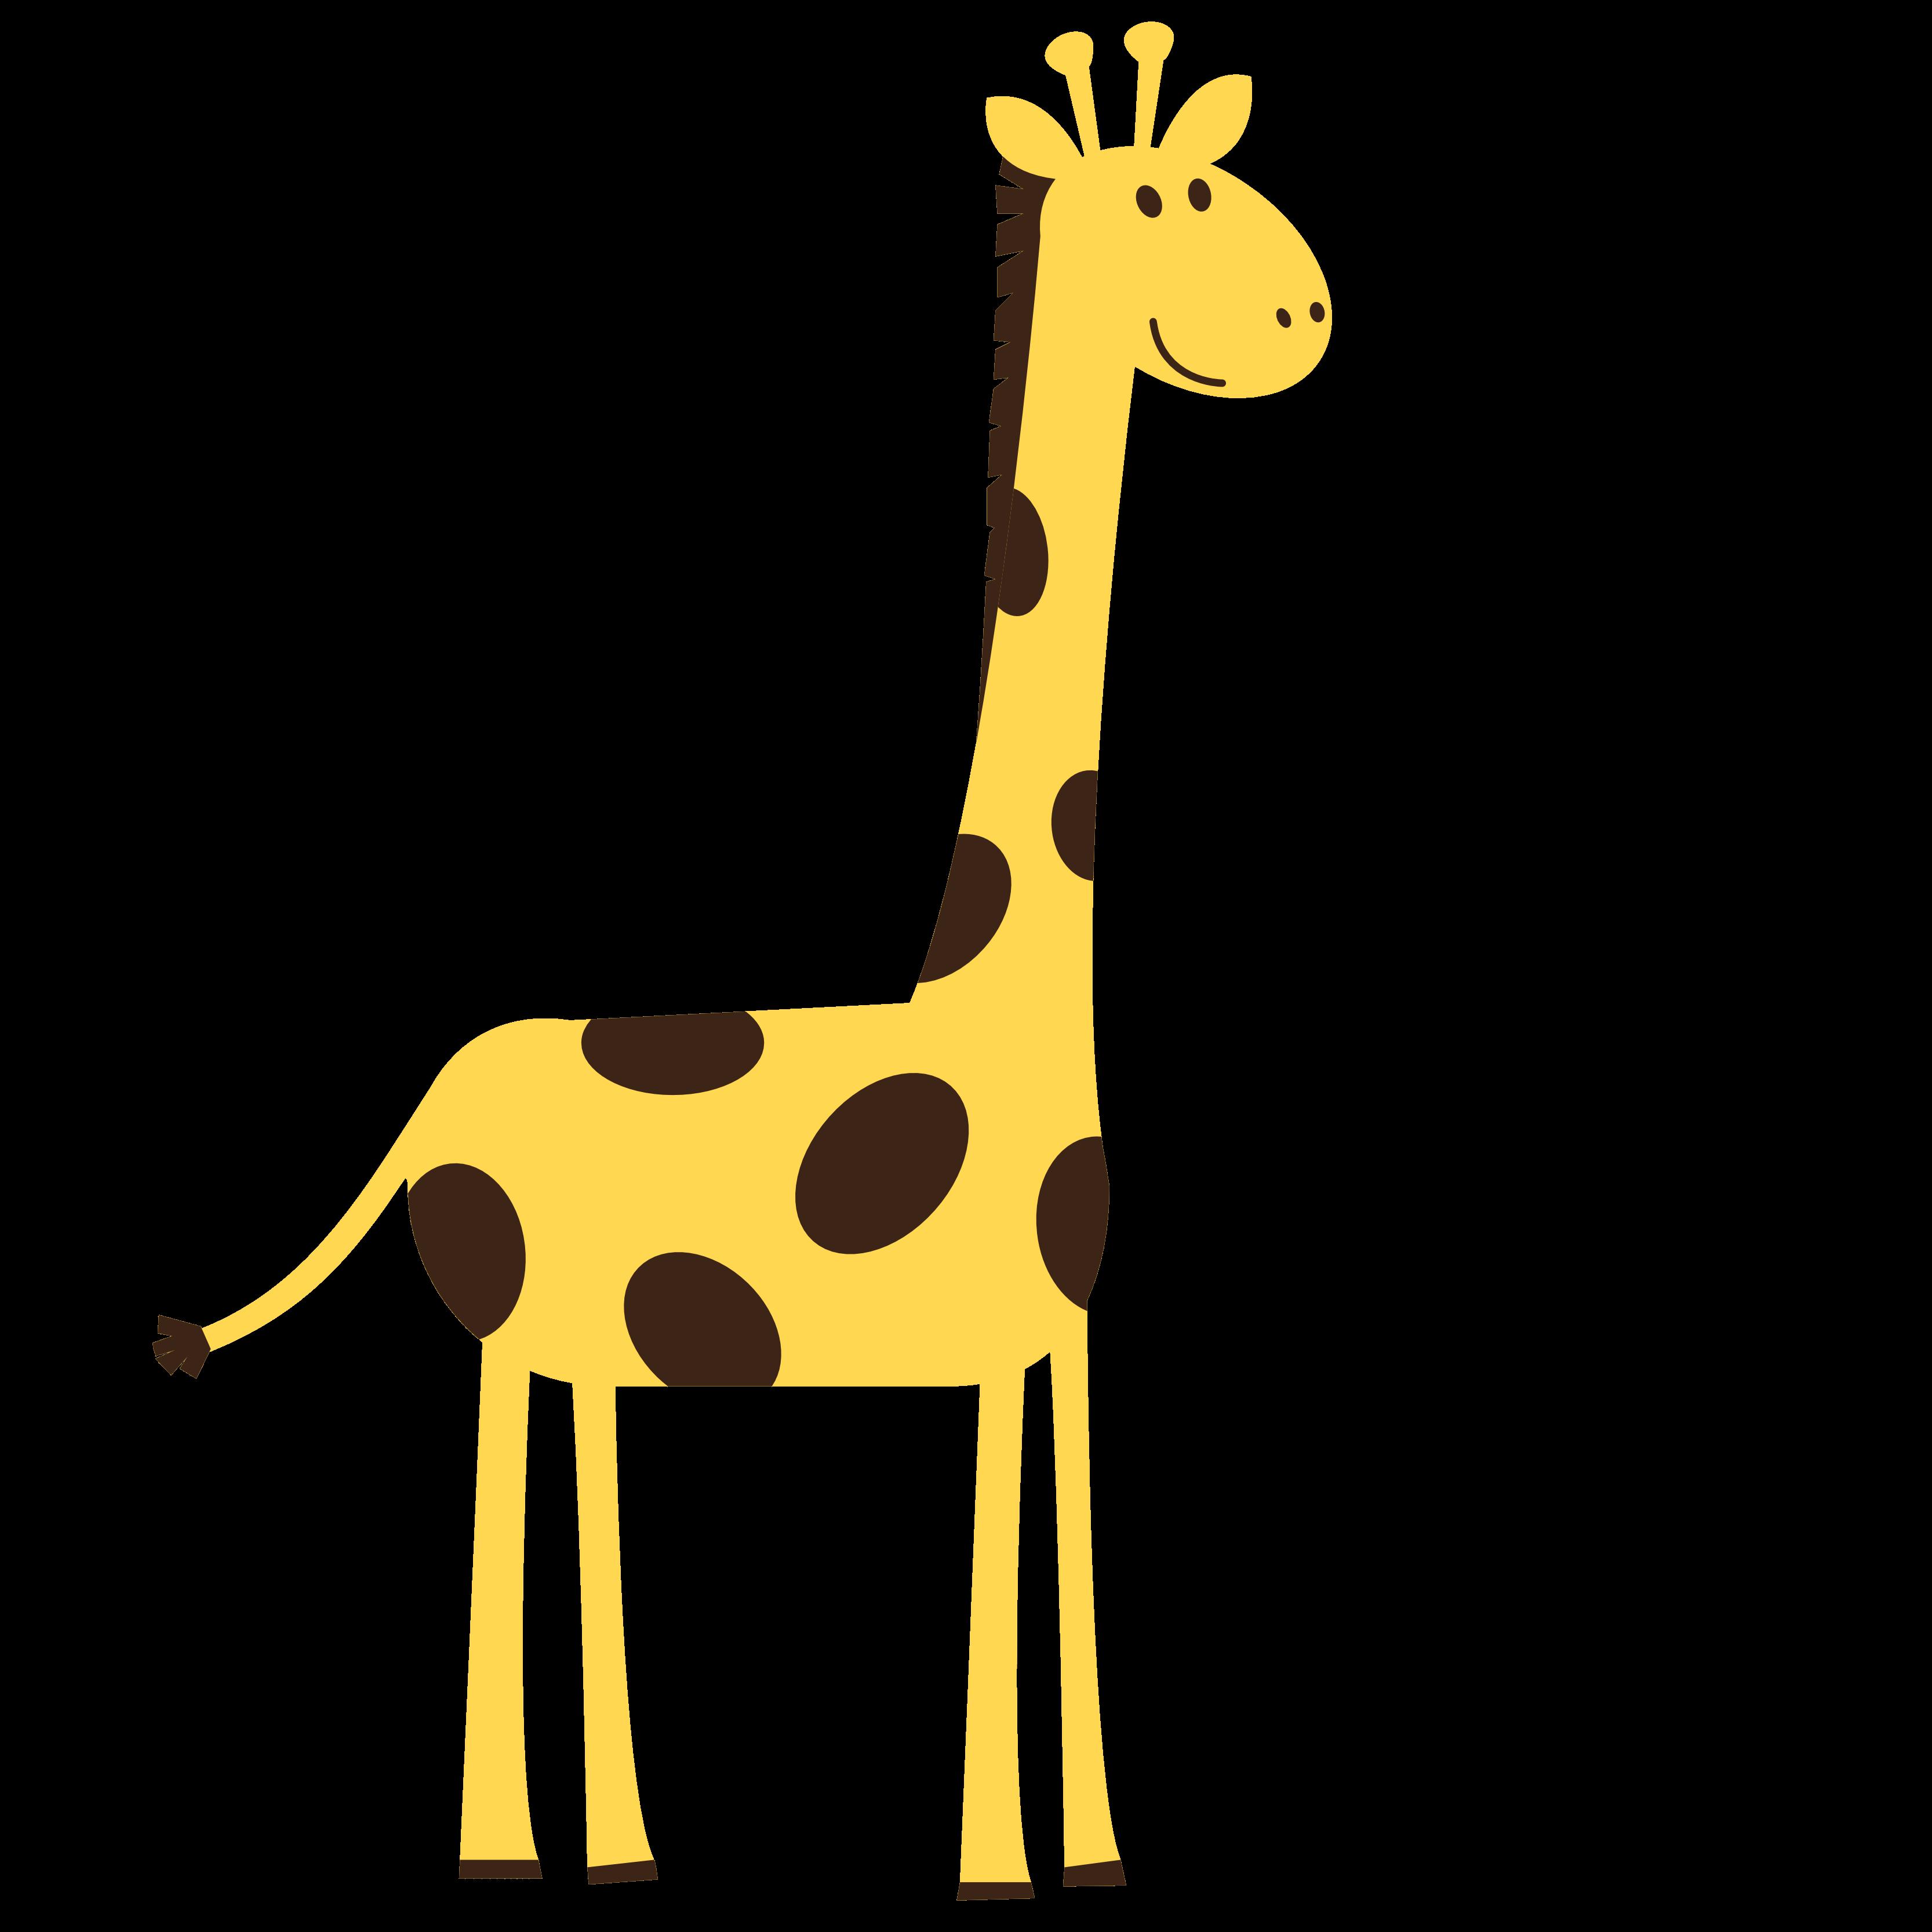 Giraffe clipart baby shower. Clip art library